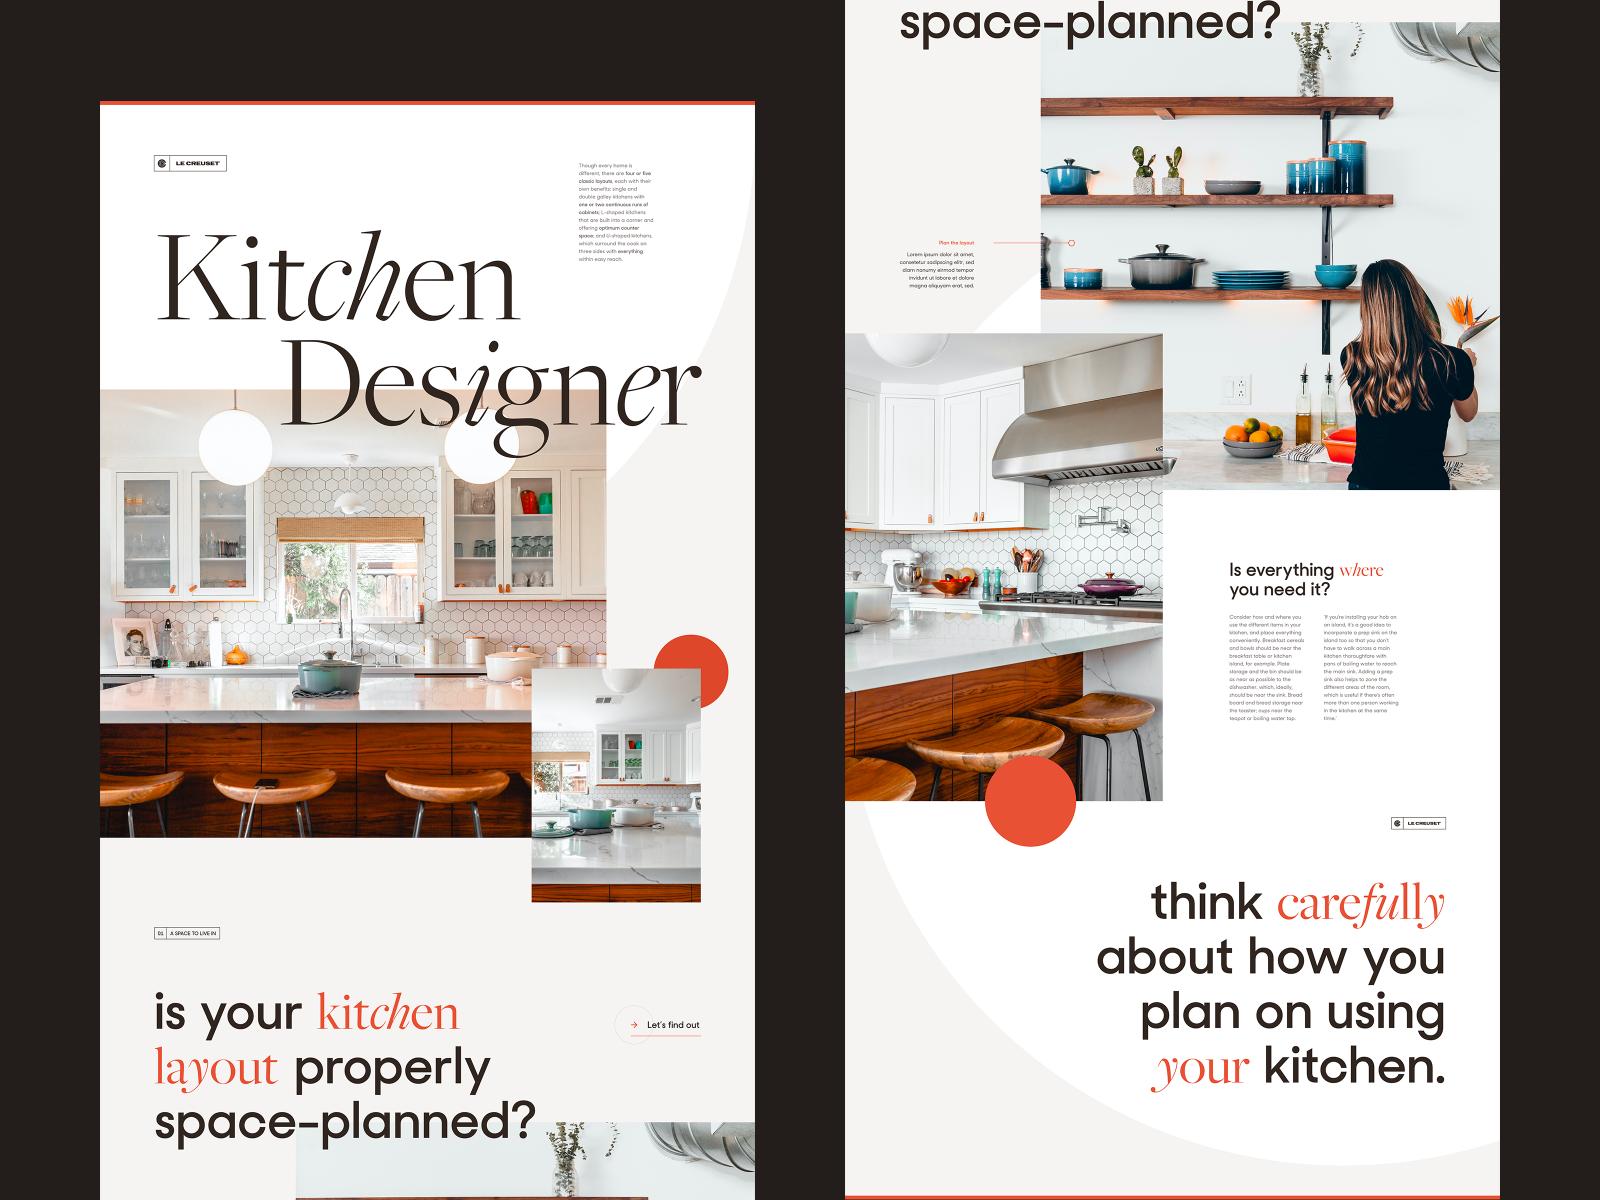 Le Creuset Kitchen Designer